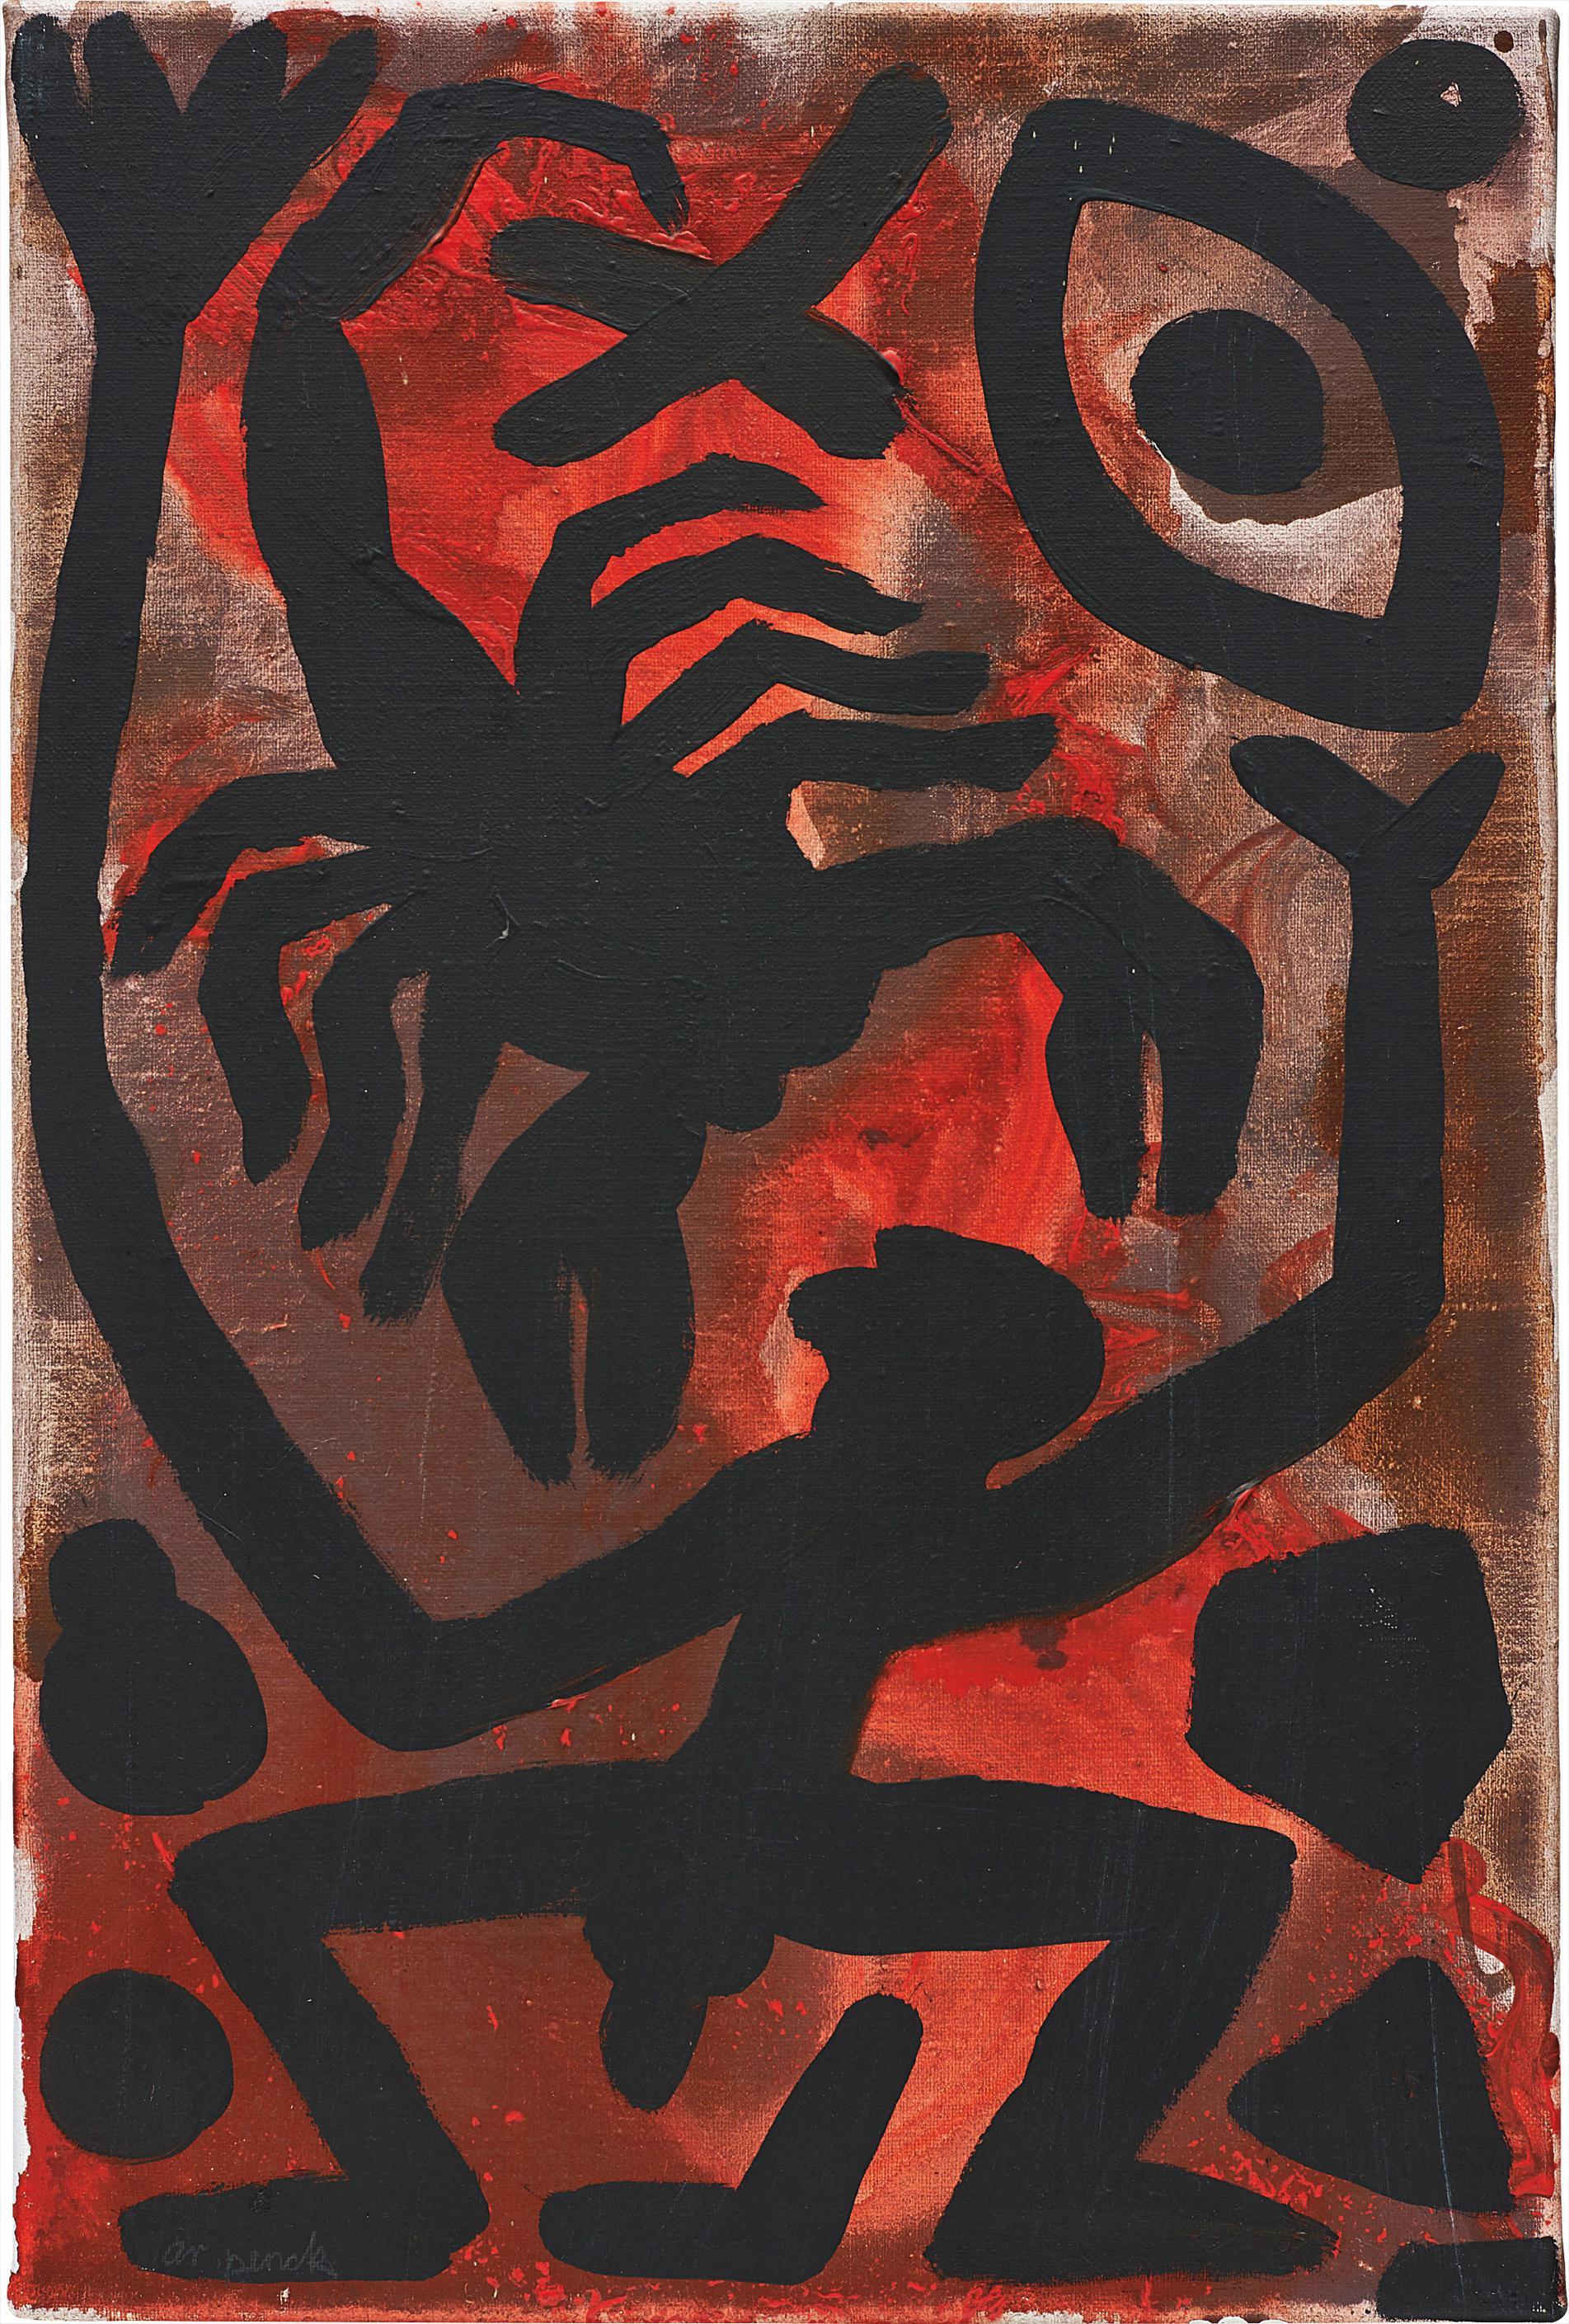 A.R. Penck-Lava Mann Skorpion Auge Pentagon-